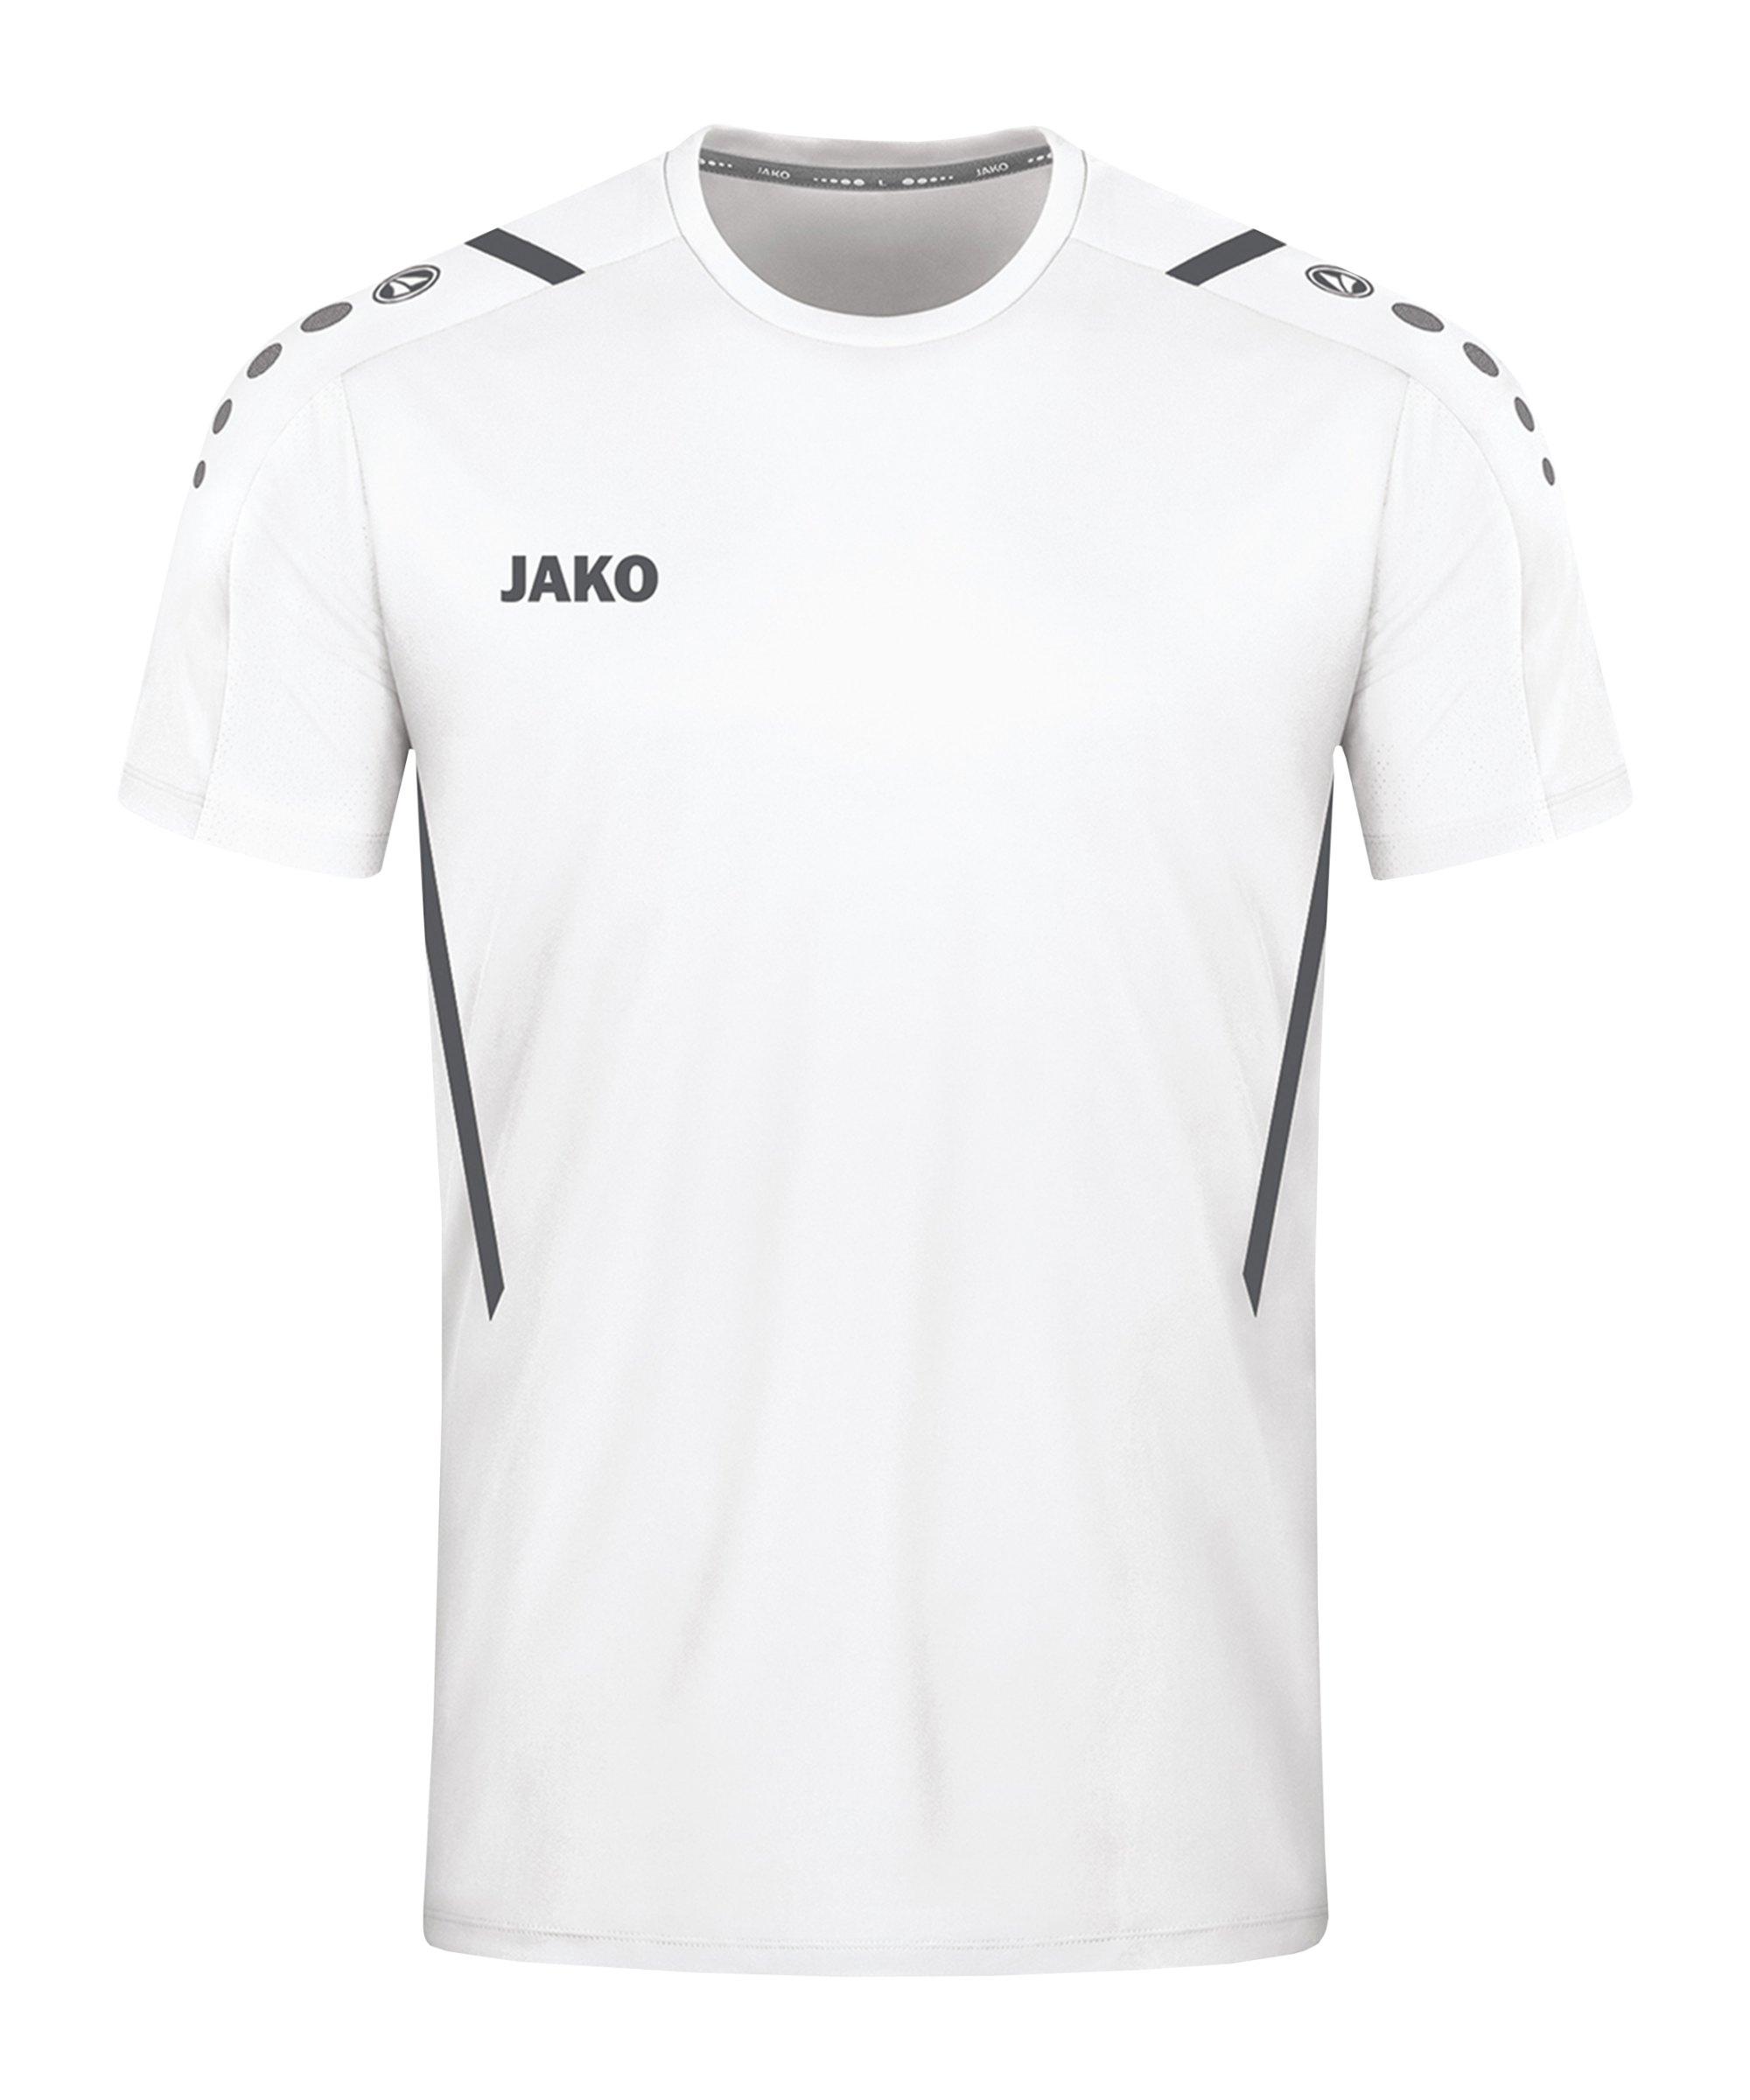 JAKO Challenge Trikot Weiss Grau F02 - weiss